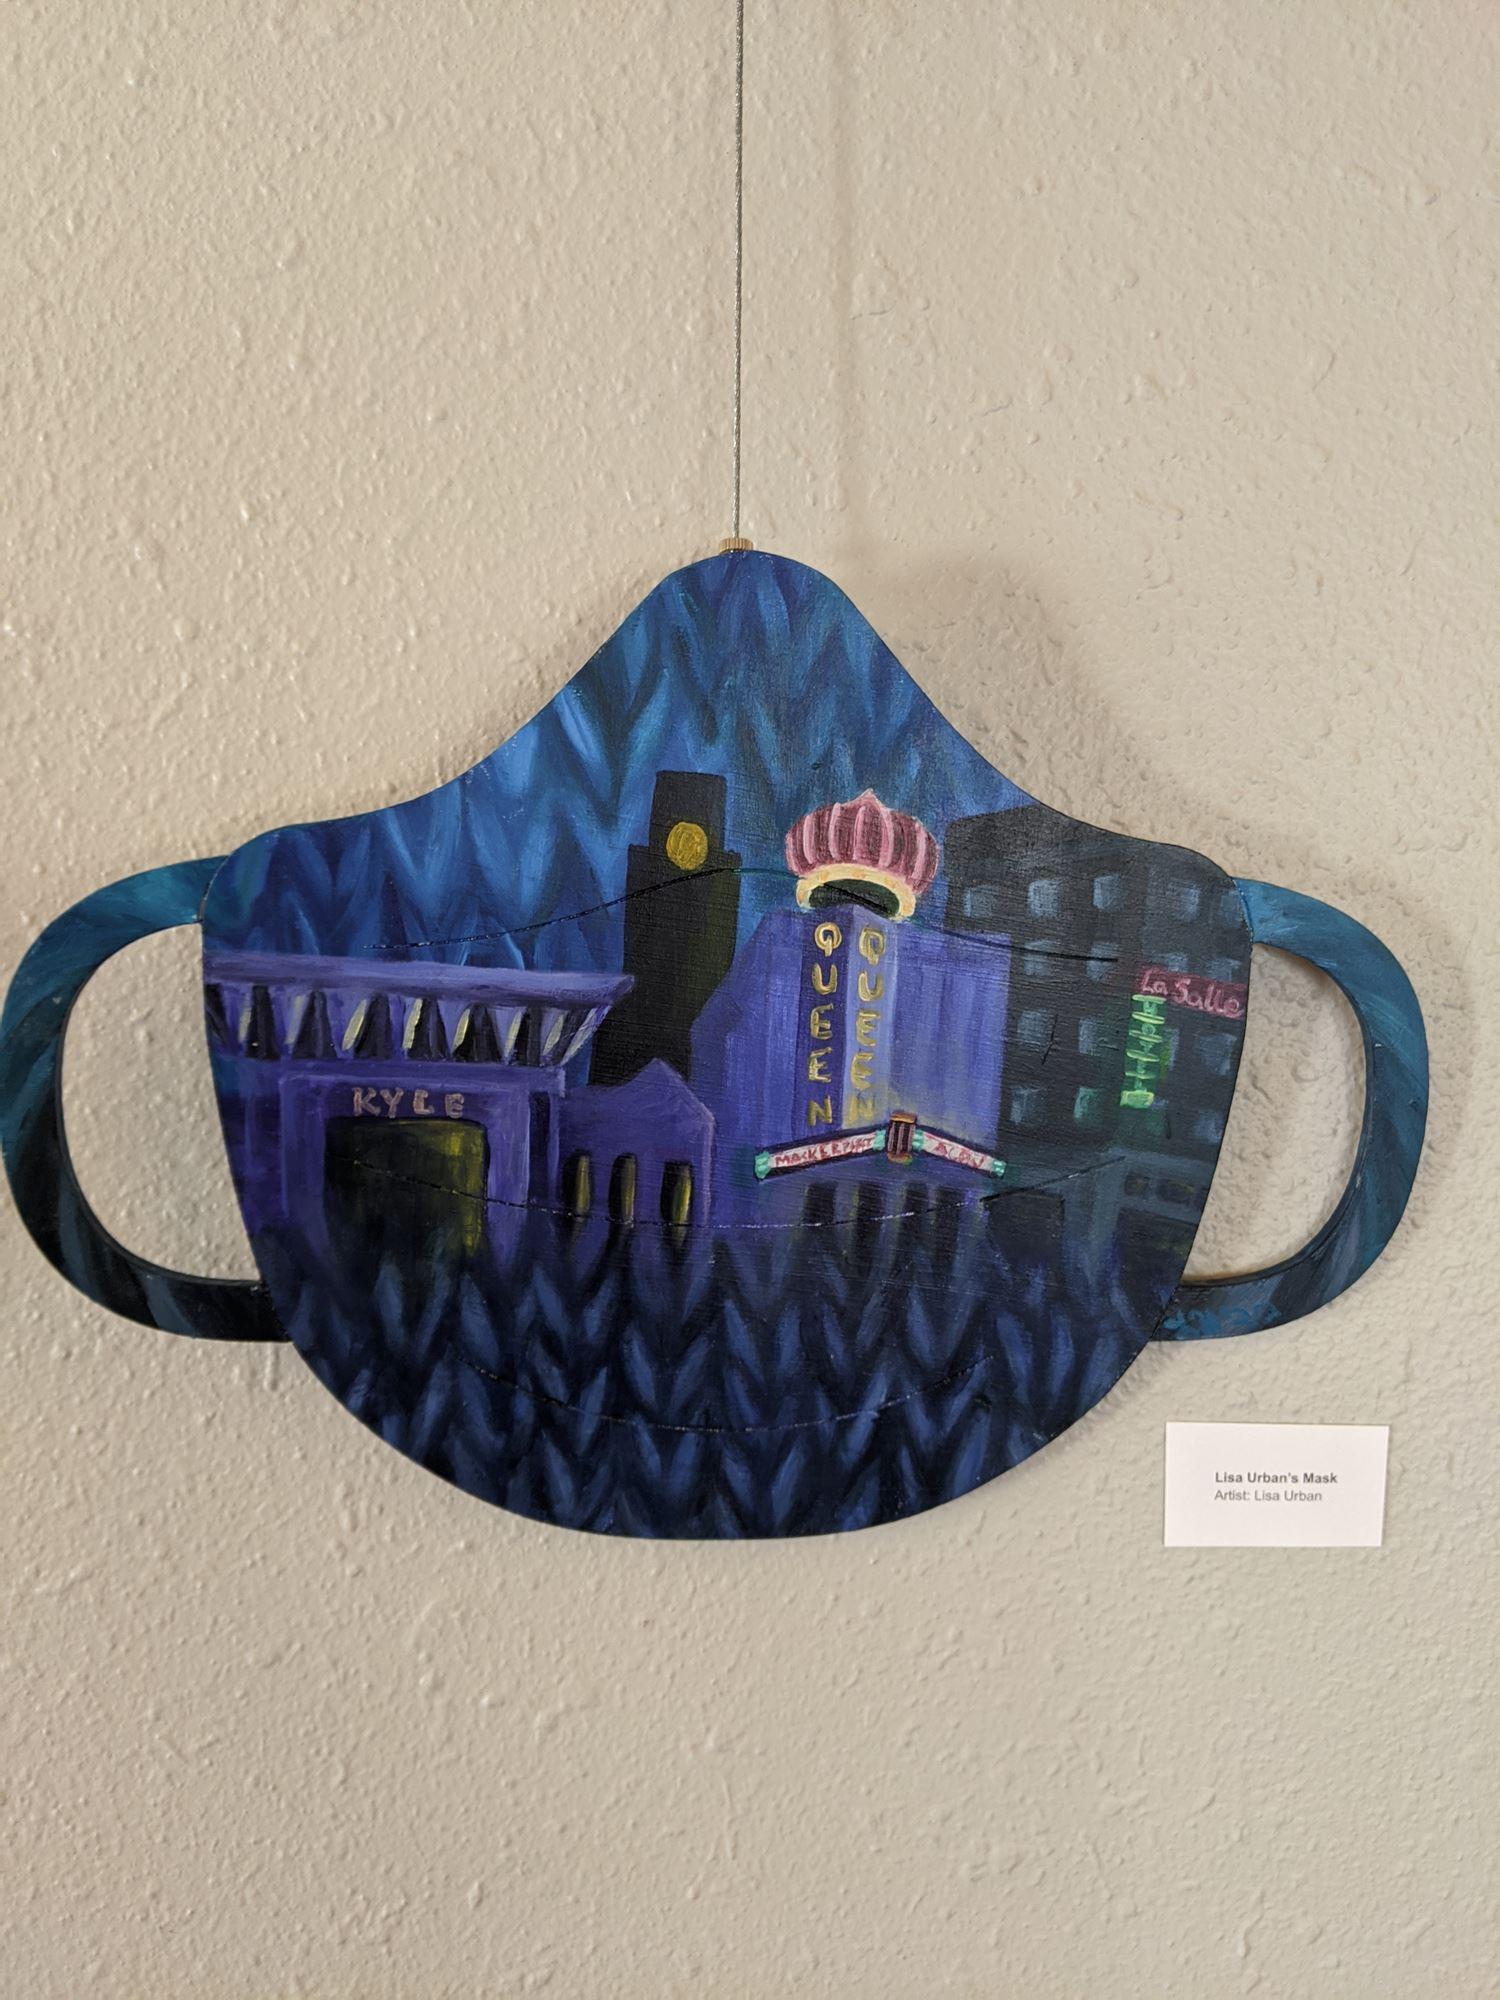 Lisa Urban- Lisa Urbans Mask